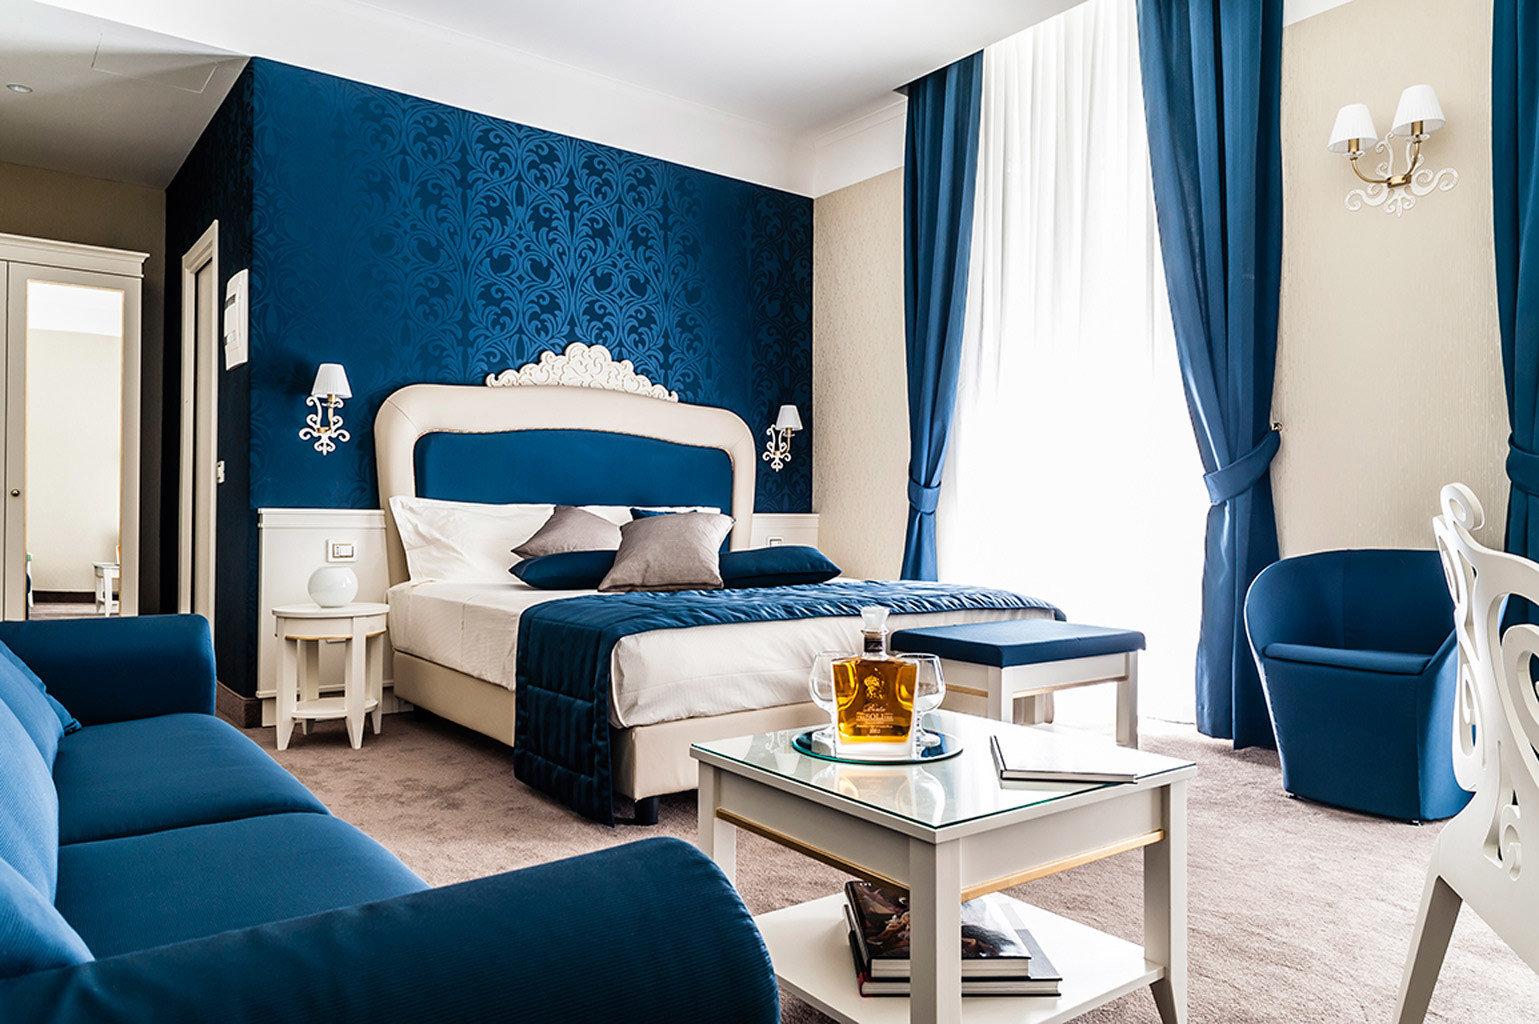 Hotel Dei Borgia Rome